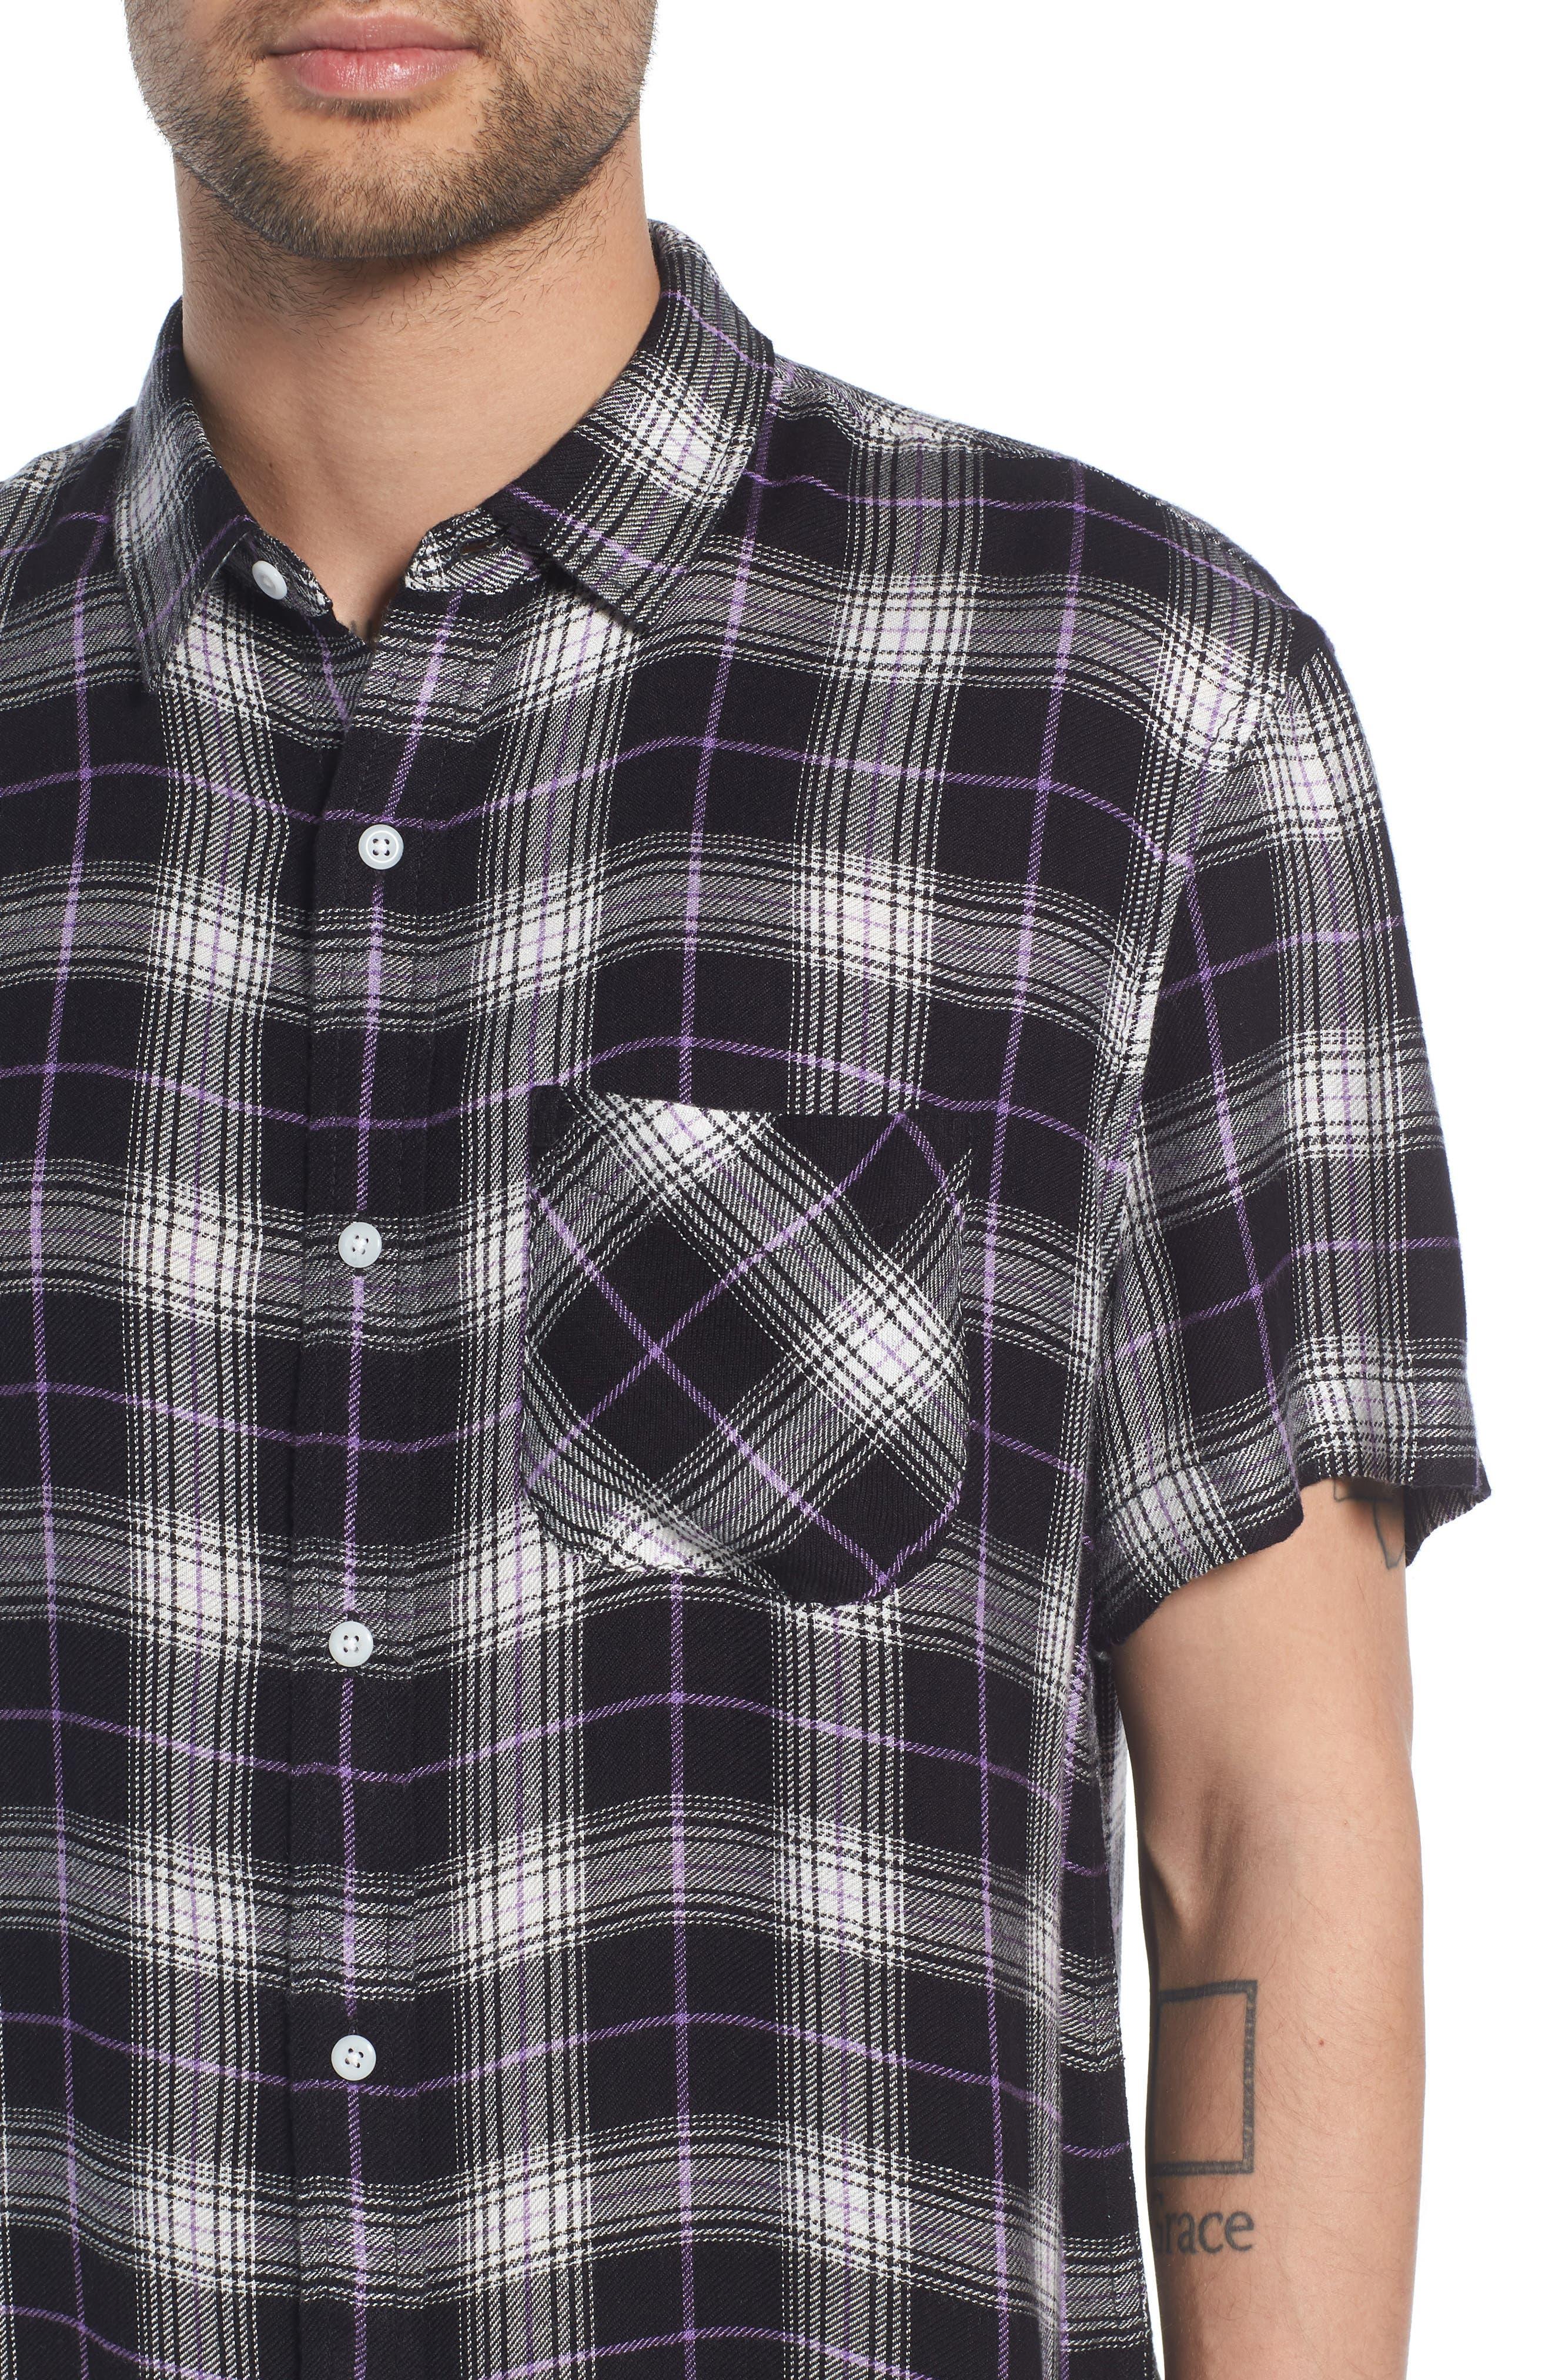 Drapey Plaid Short Sleeve Shirt,                             Alternate thumbnail 4, color,                             BLACK ROCK CODY PLAID